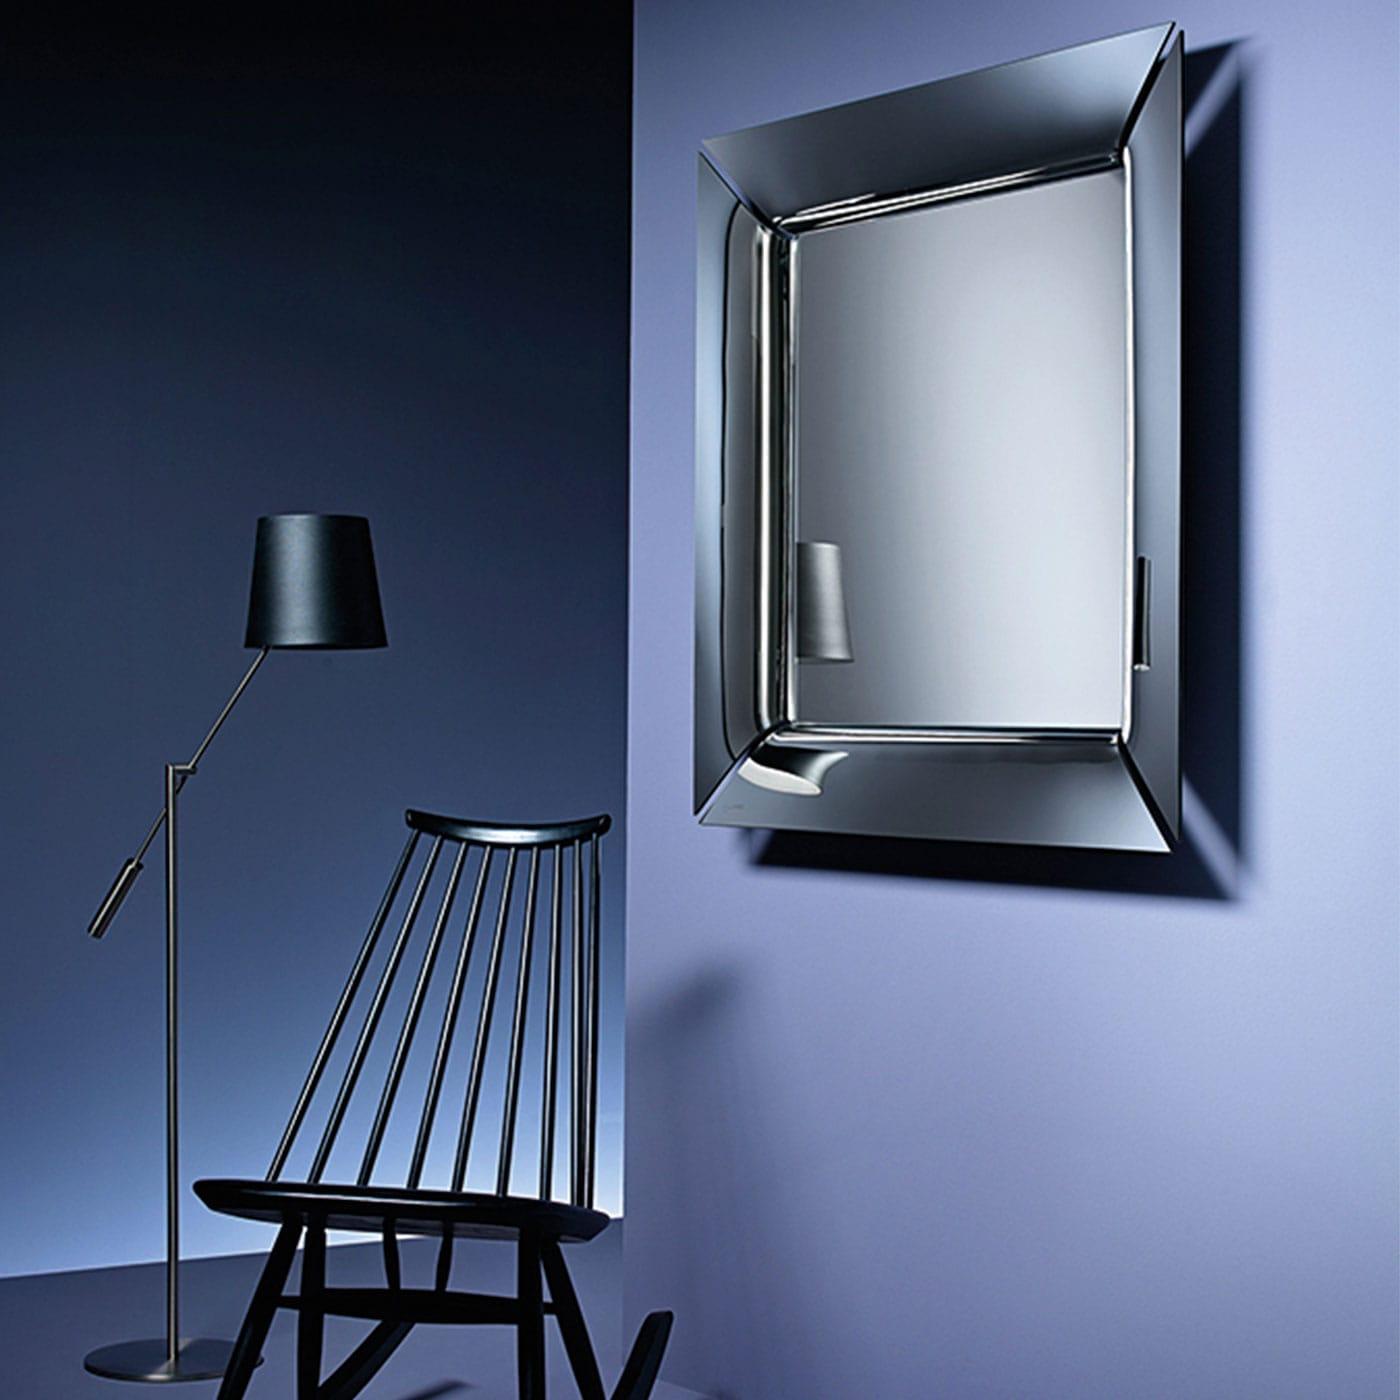 Caadre specchio